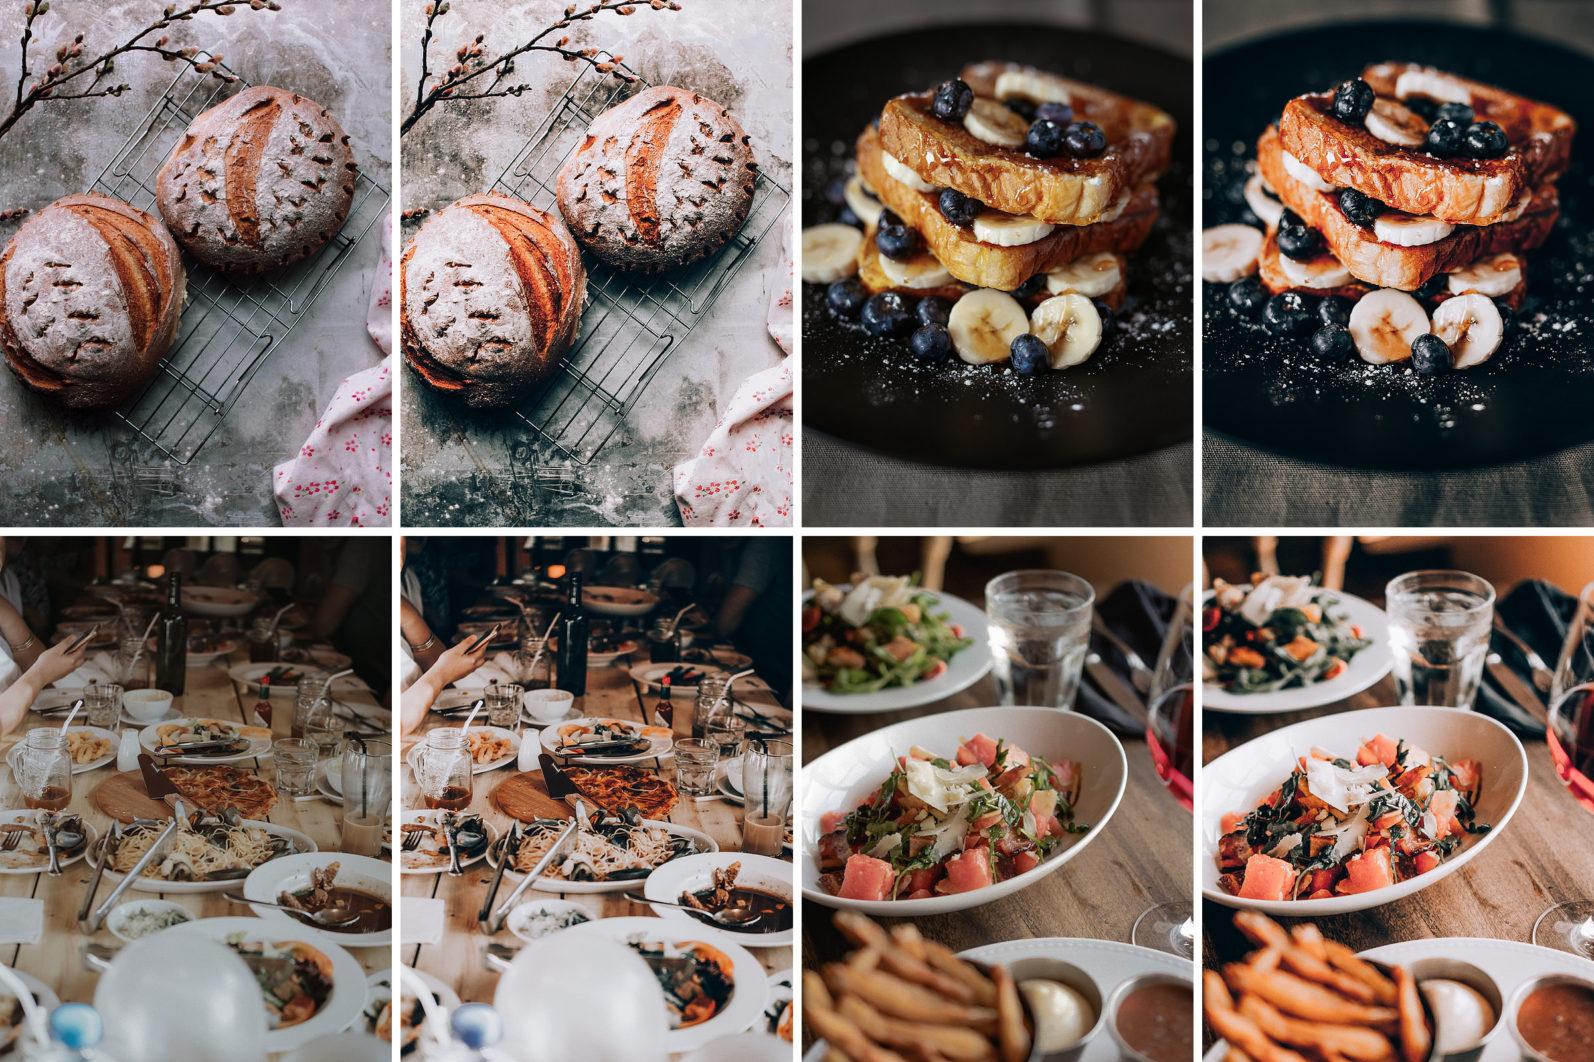 58. Rustic Food - 58.RUSTIC FOOD 04 -